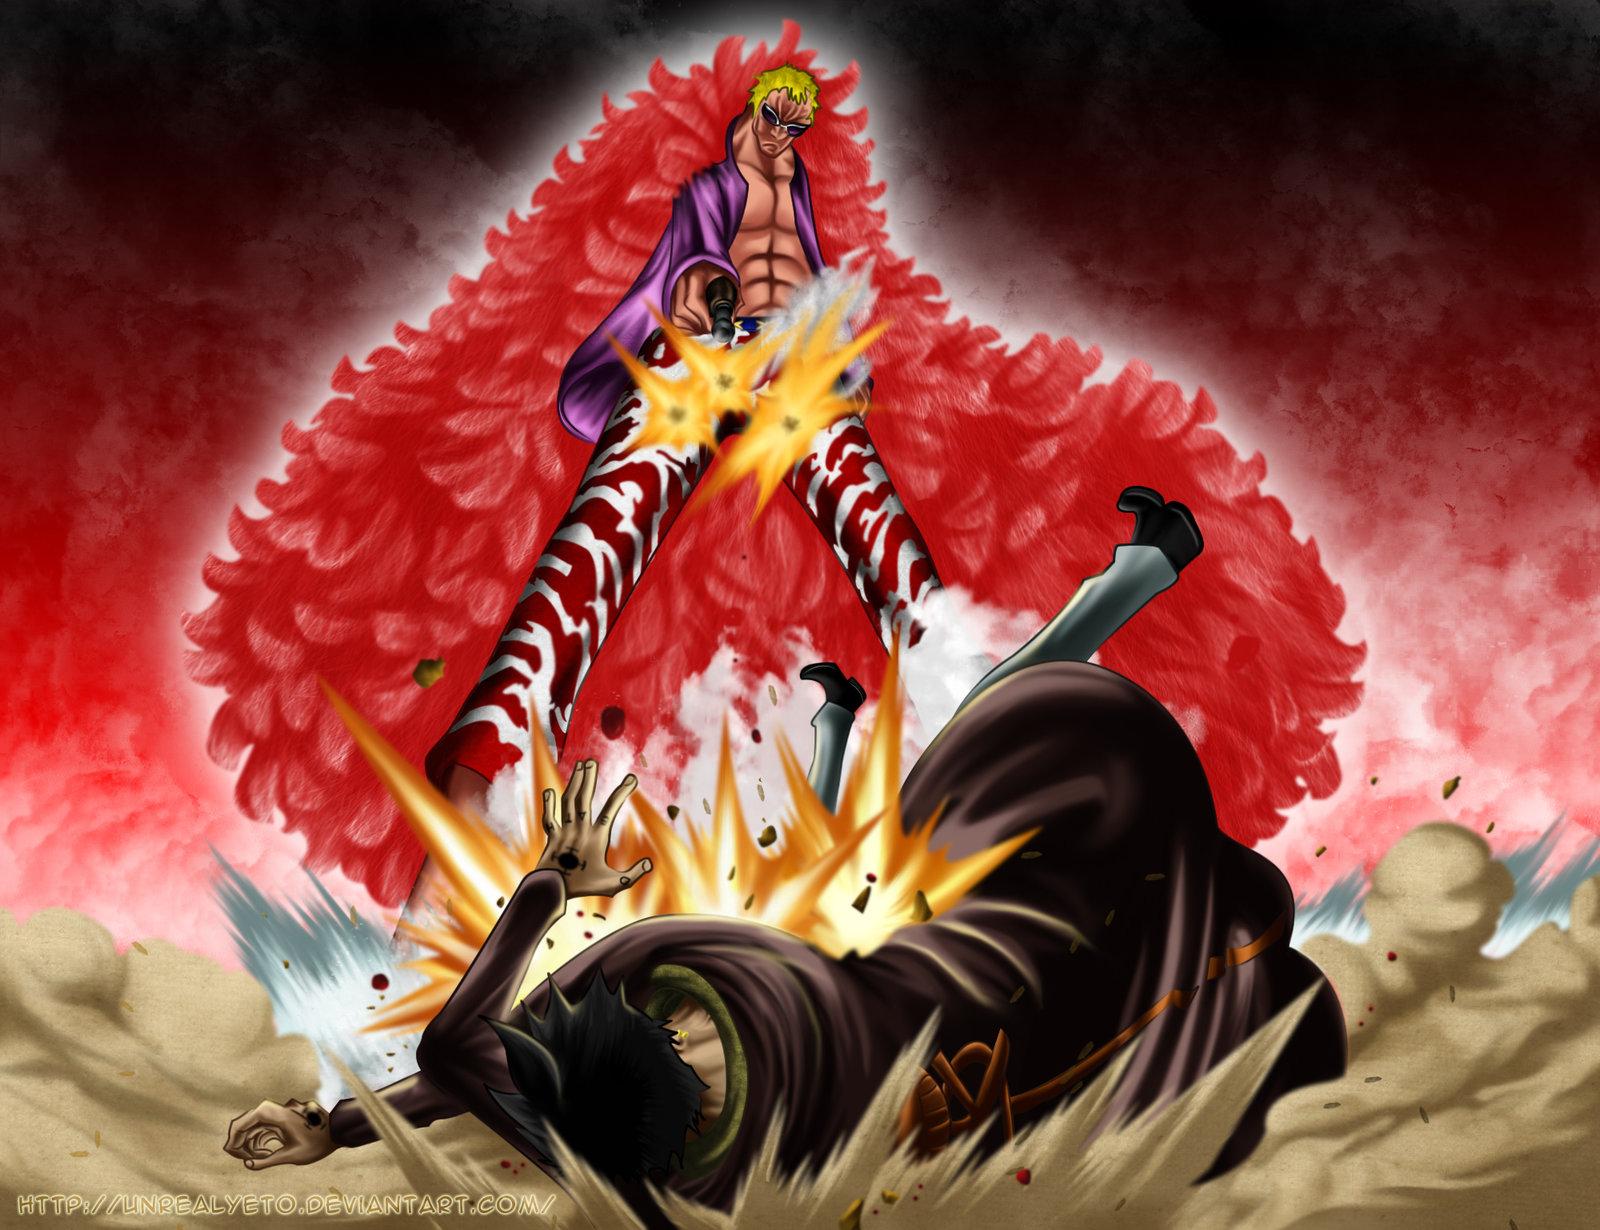 One Piece Doflamingo Wallpaper Wallpapersafari